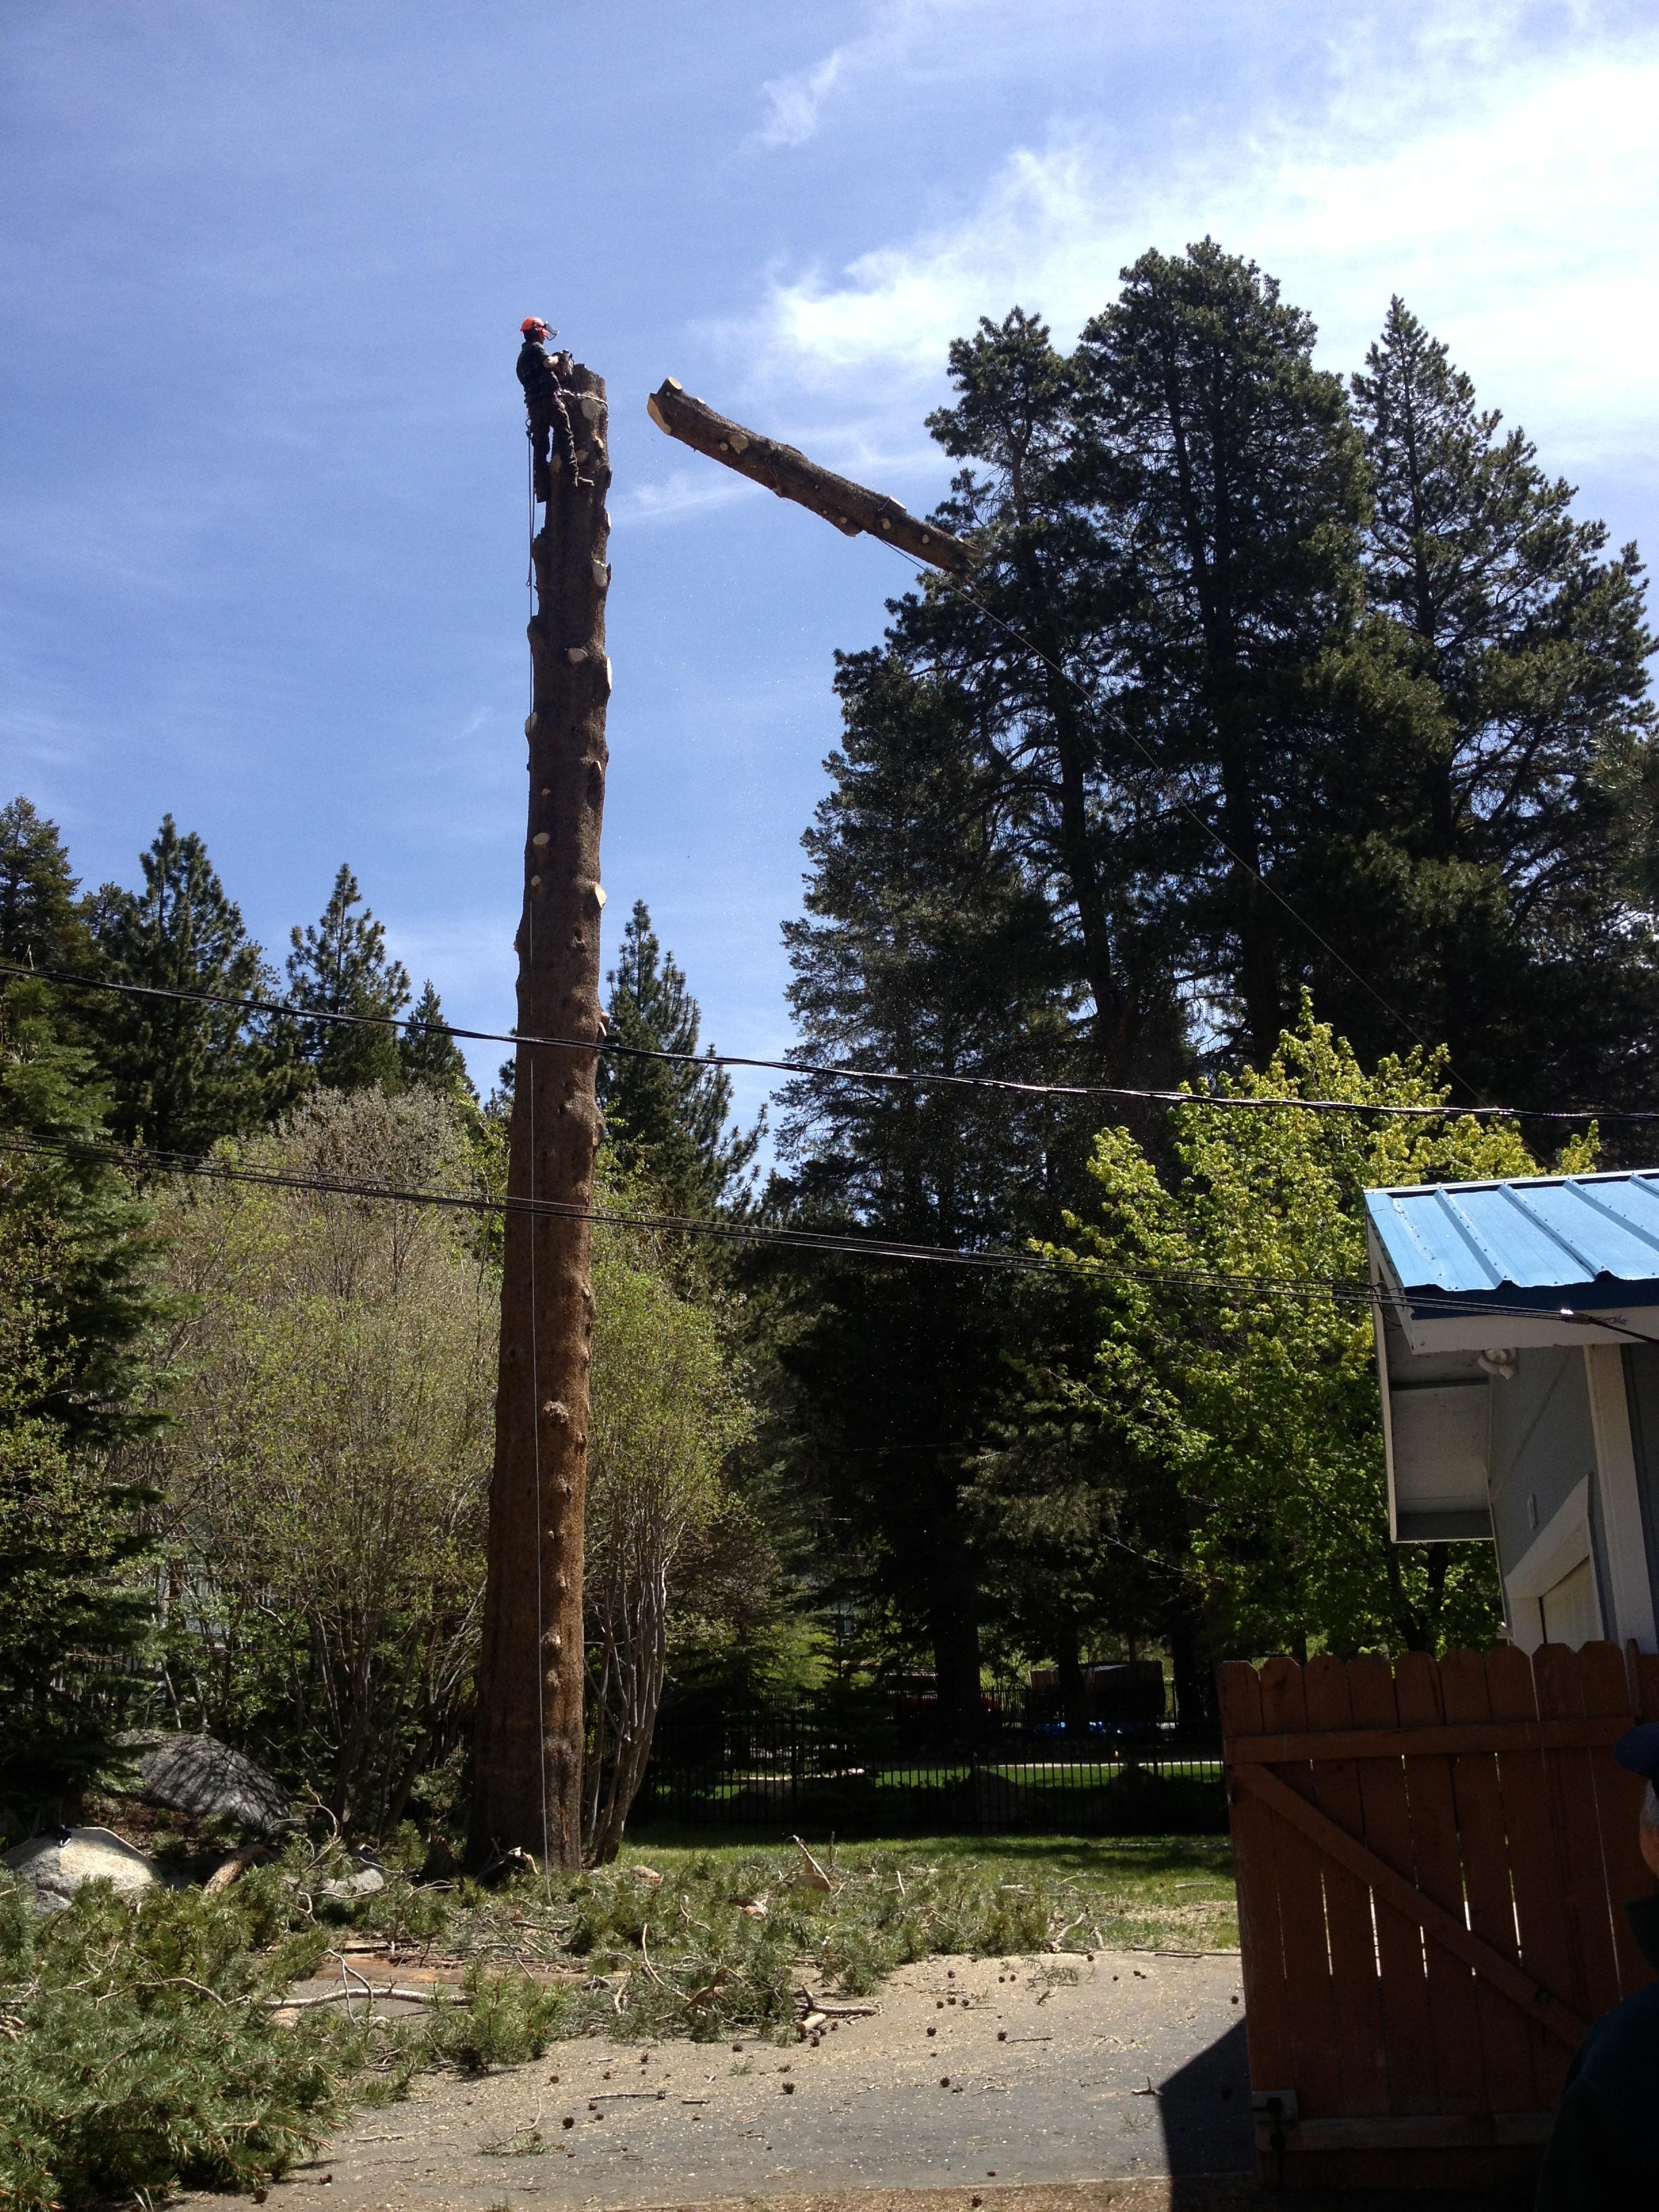 tree removal in progress